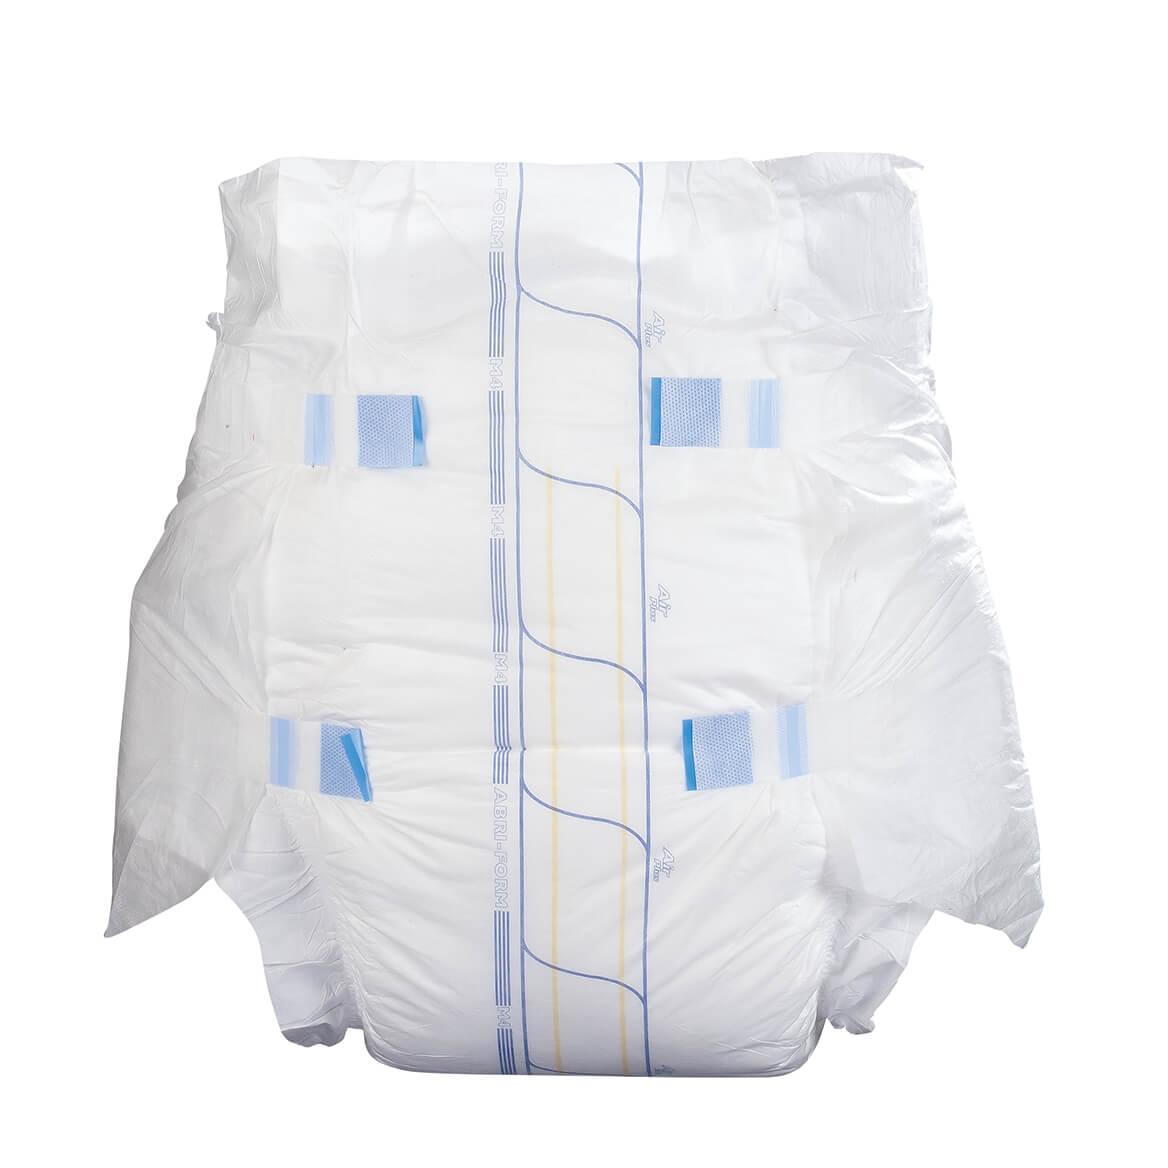 Abri-Form™ 135oz. Premium Adult Briefs Large, Case of 48-368454